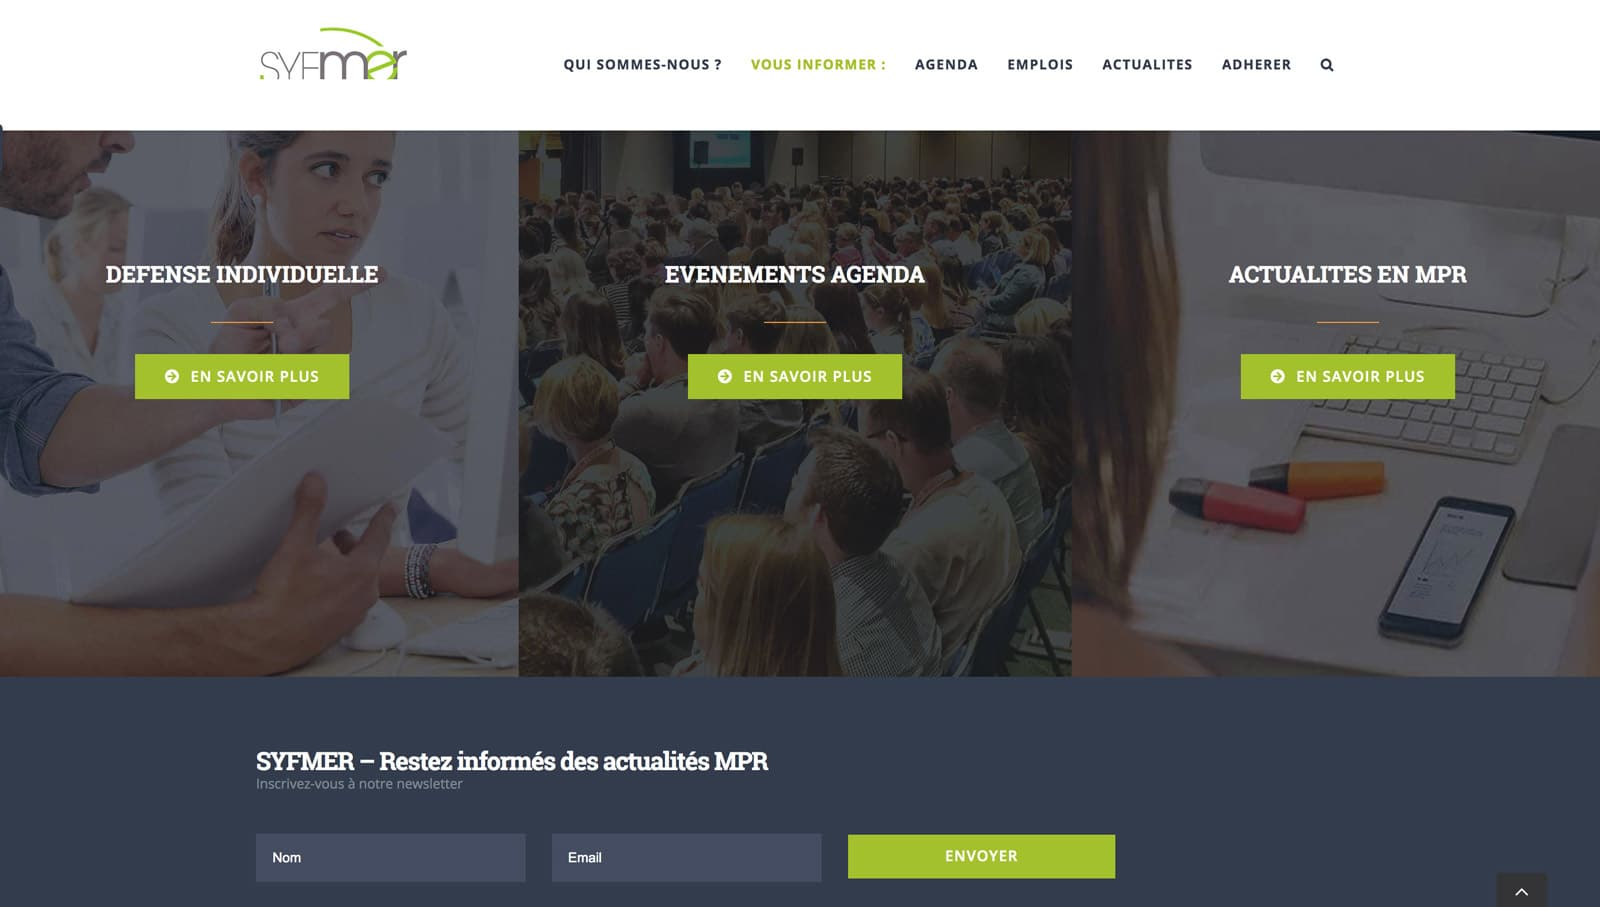 createur_site_internet_vendee_nantes_paris_syfmer